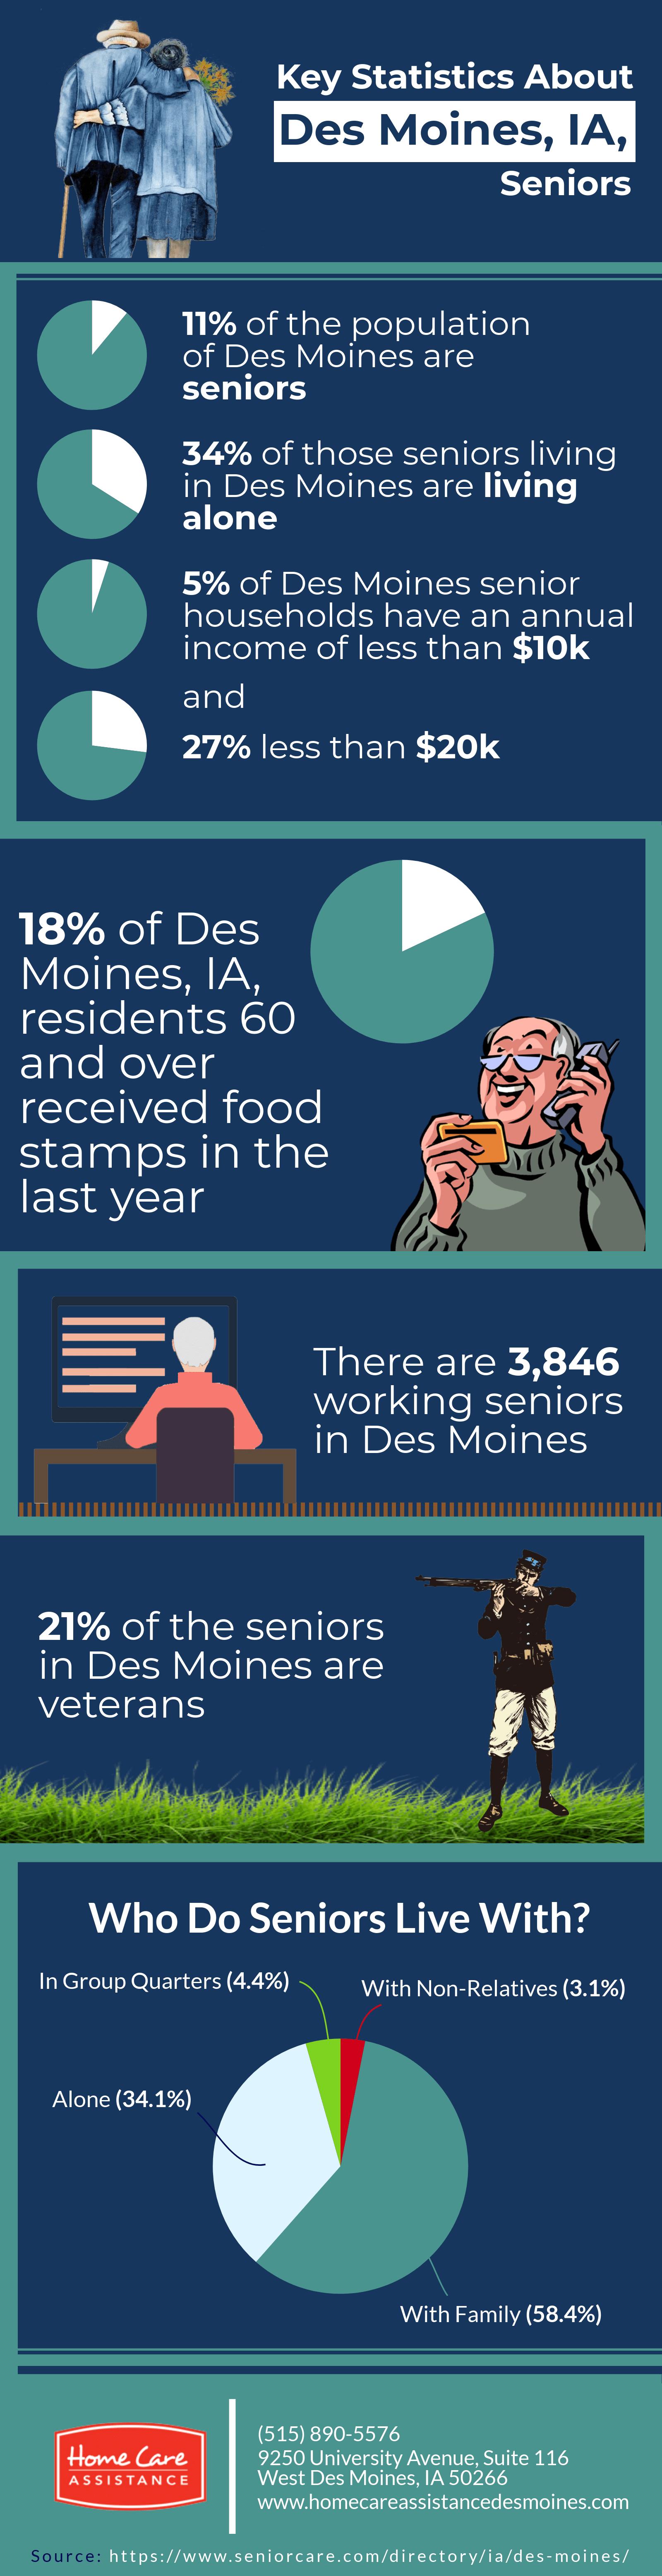 Key Statistics About Des Moines, IA, Seniors [Infographic]